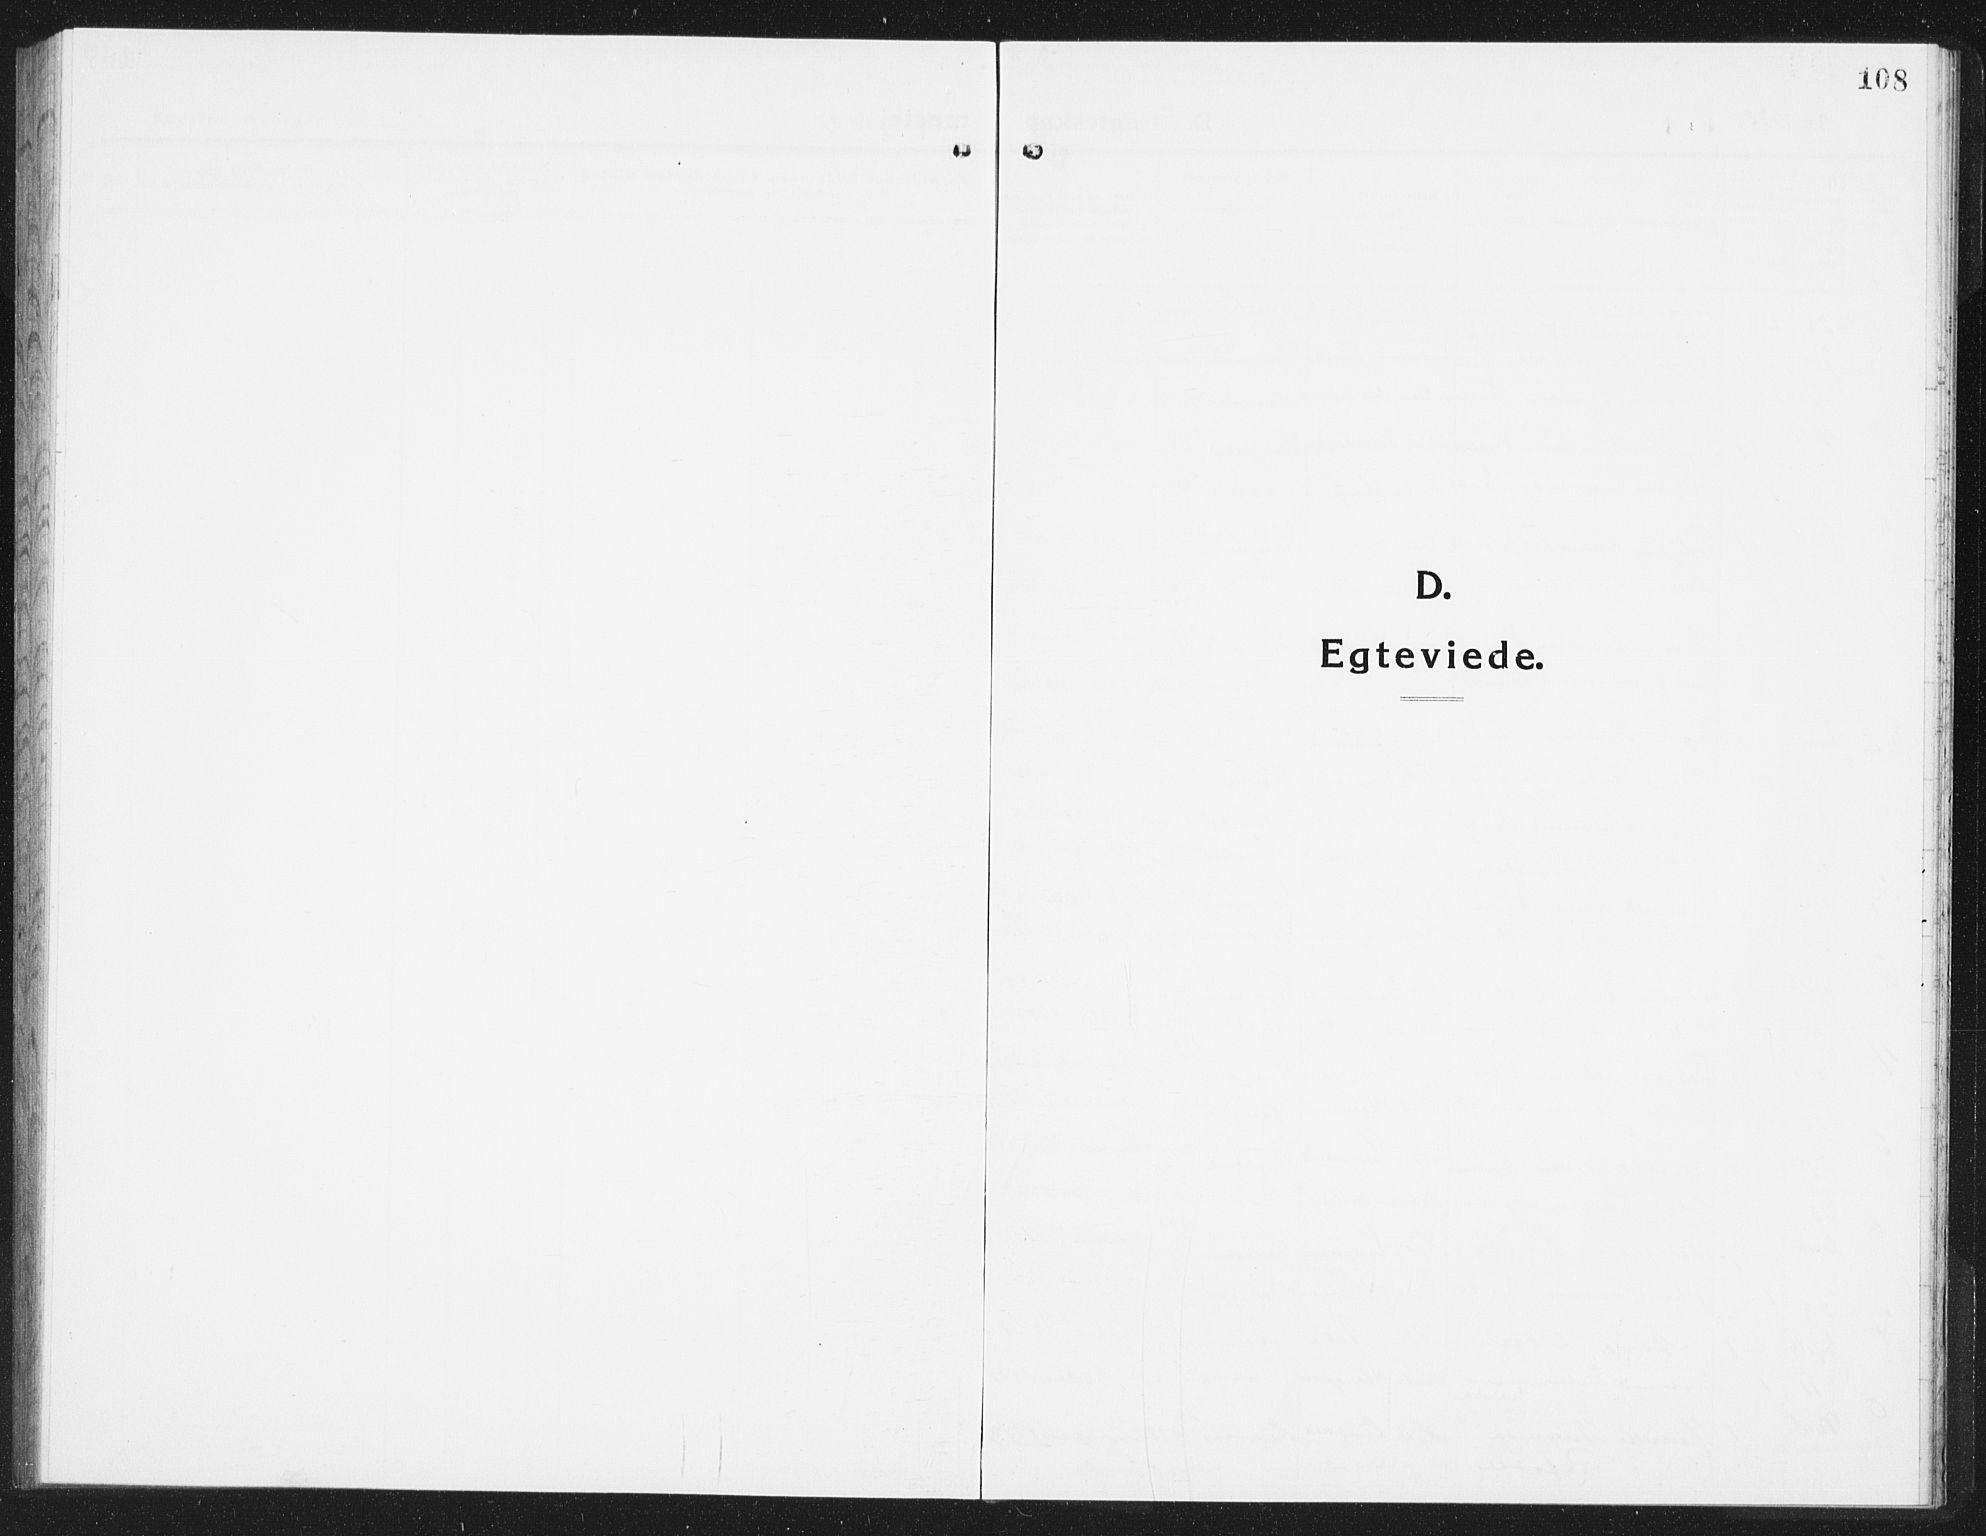 SAST, Kopervik sokneprestkontor, H/Ha/Hab/L0007: Klokkerbok nr. B 7, 1918-1942, s. 108